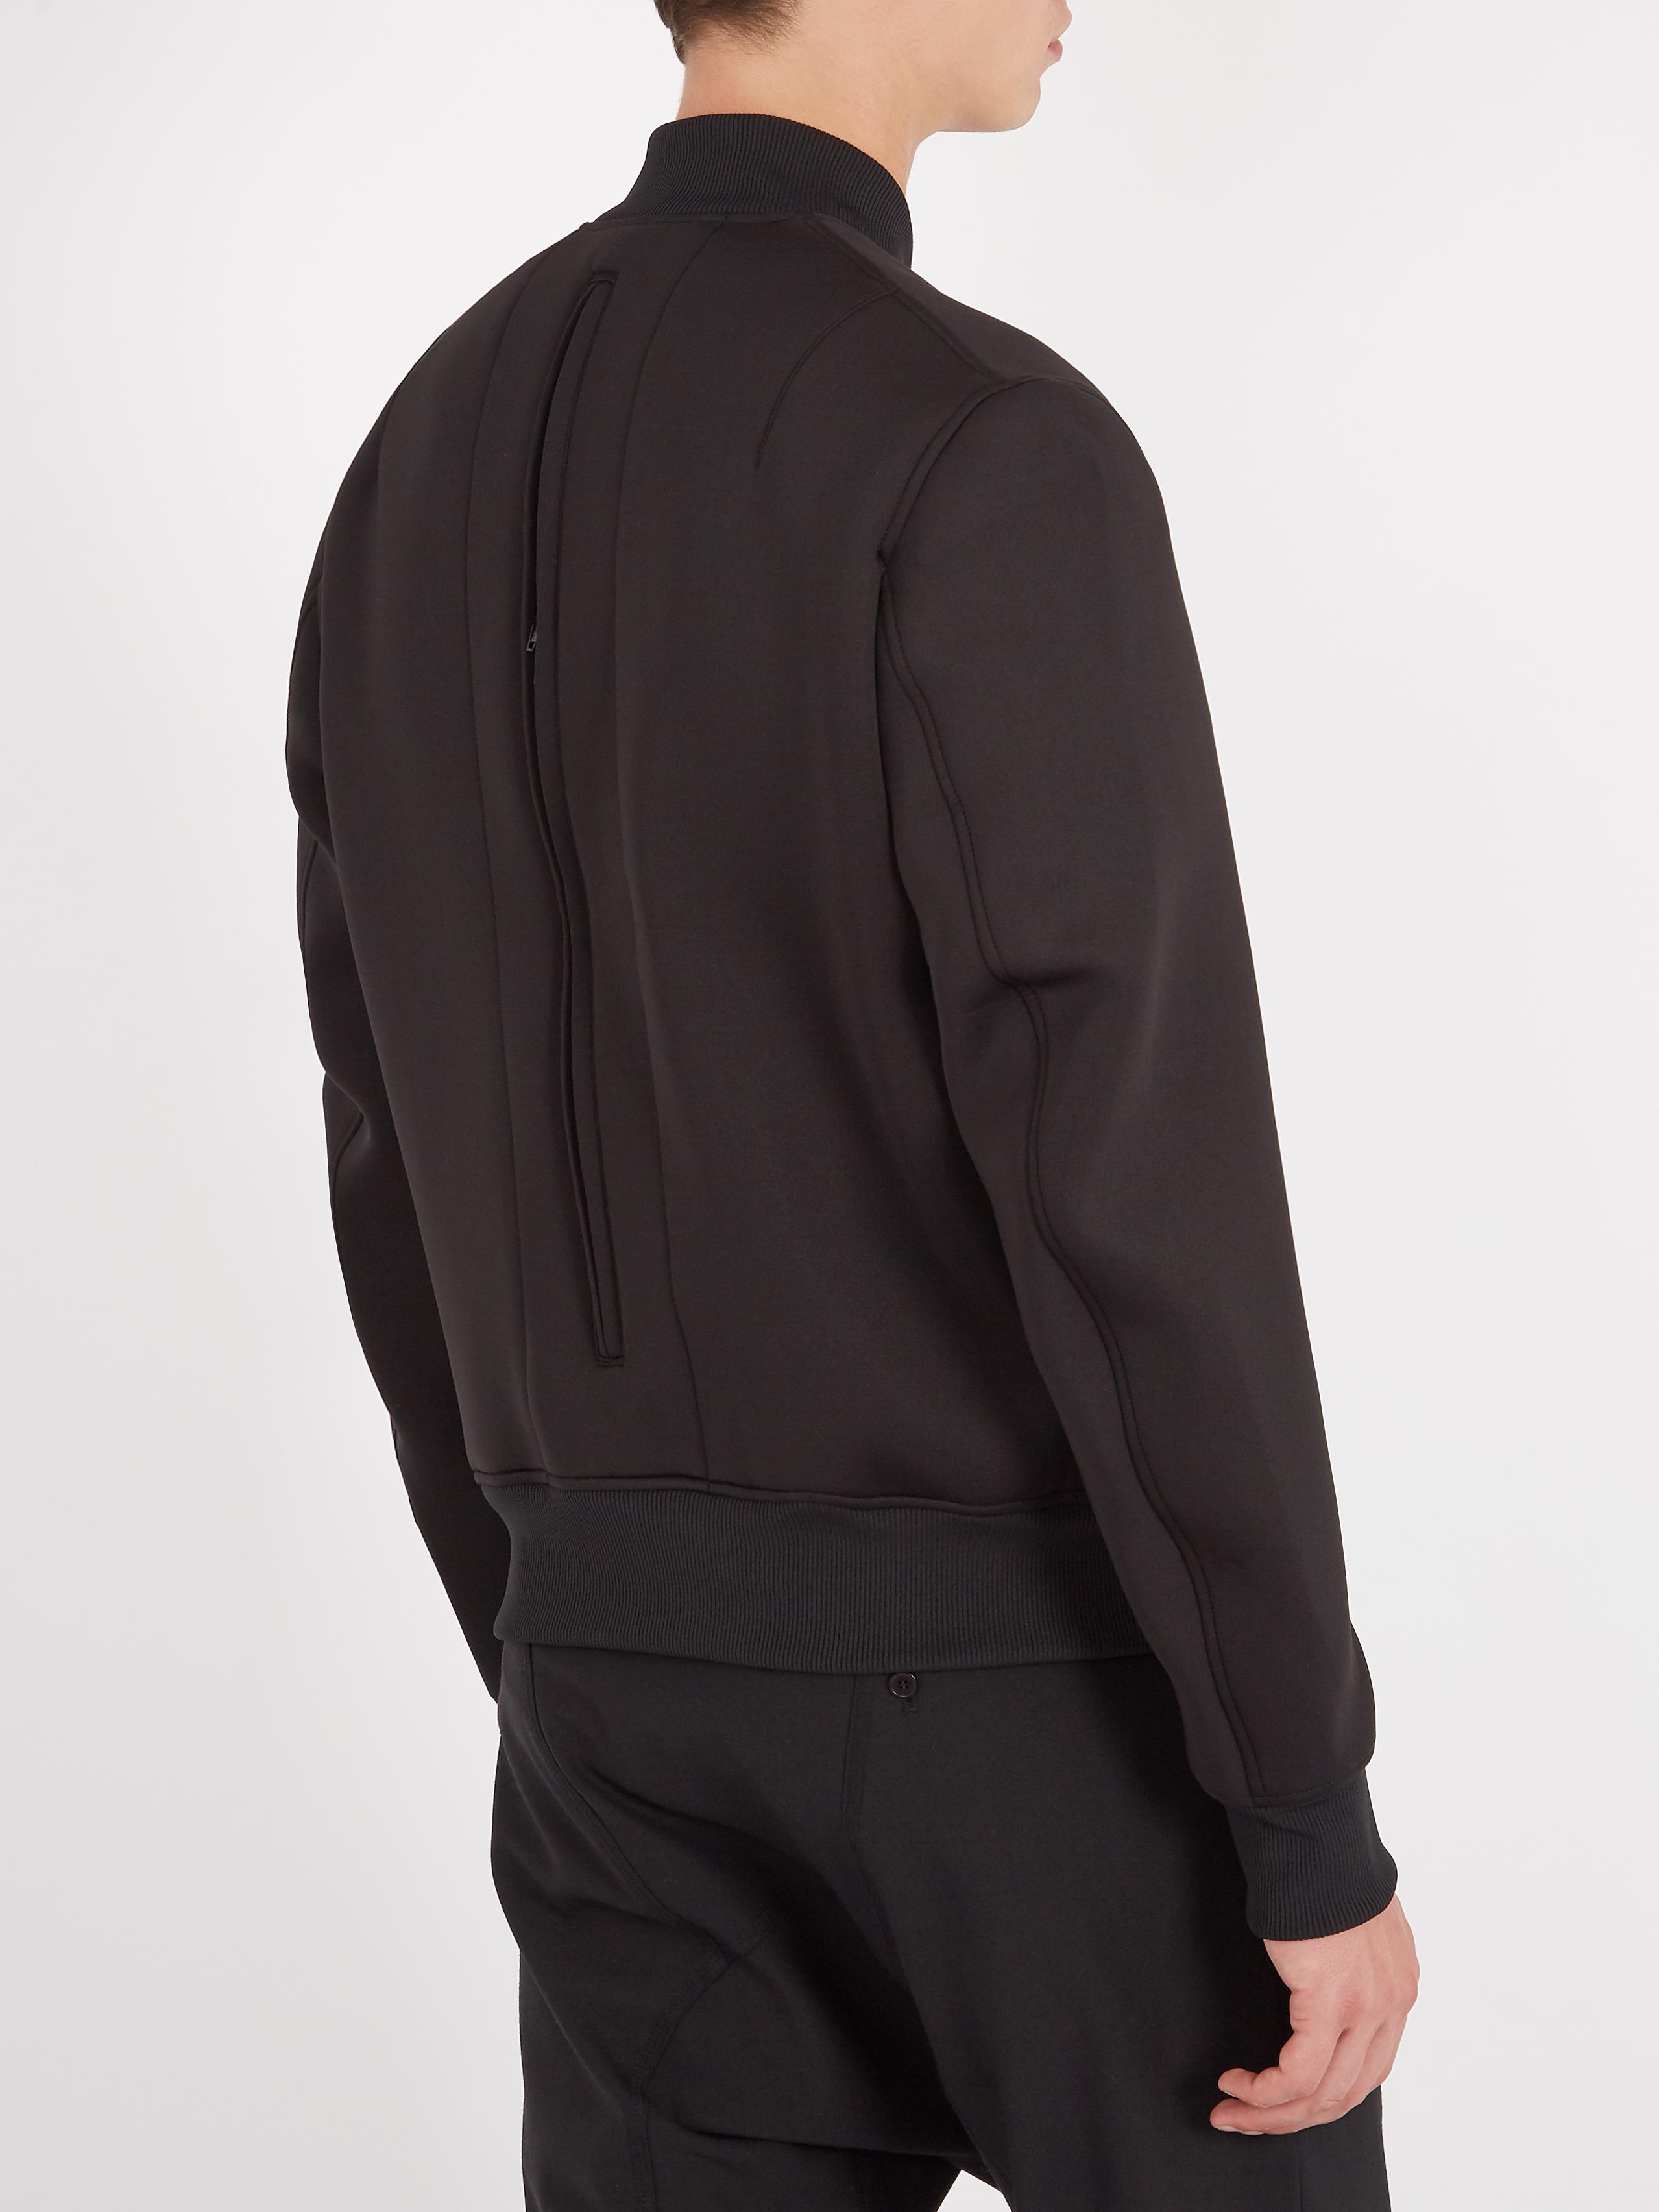 ... Ultratech Backpack - Lyst  size 40 434e3 db341 Lyst Y 3 Zip through  Neoprene Bomber Jacket in Black for Men ... c7c17a0ecb